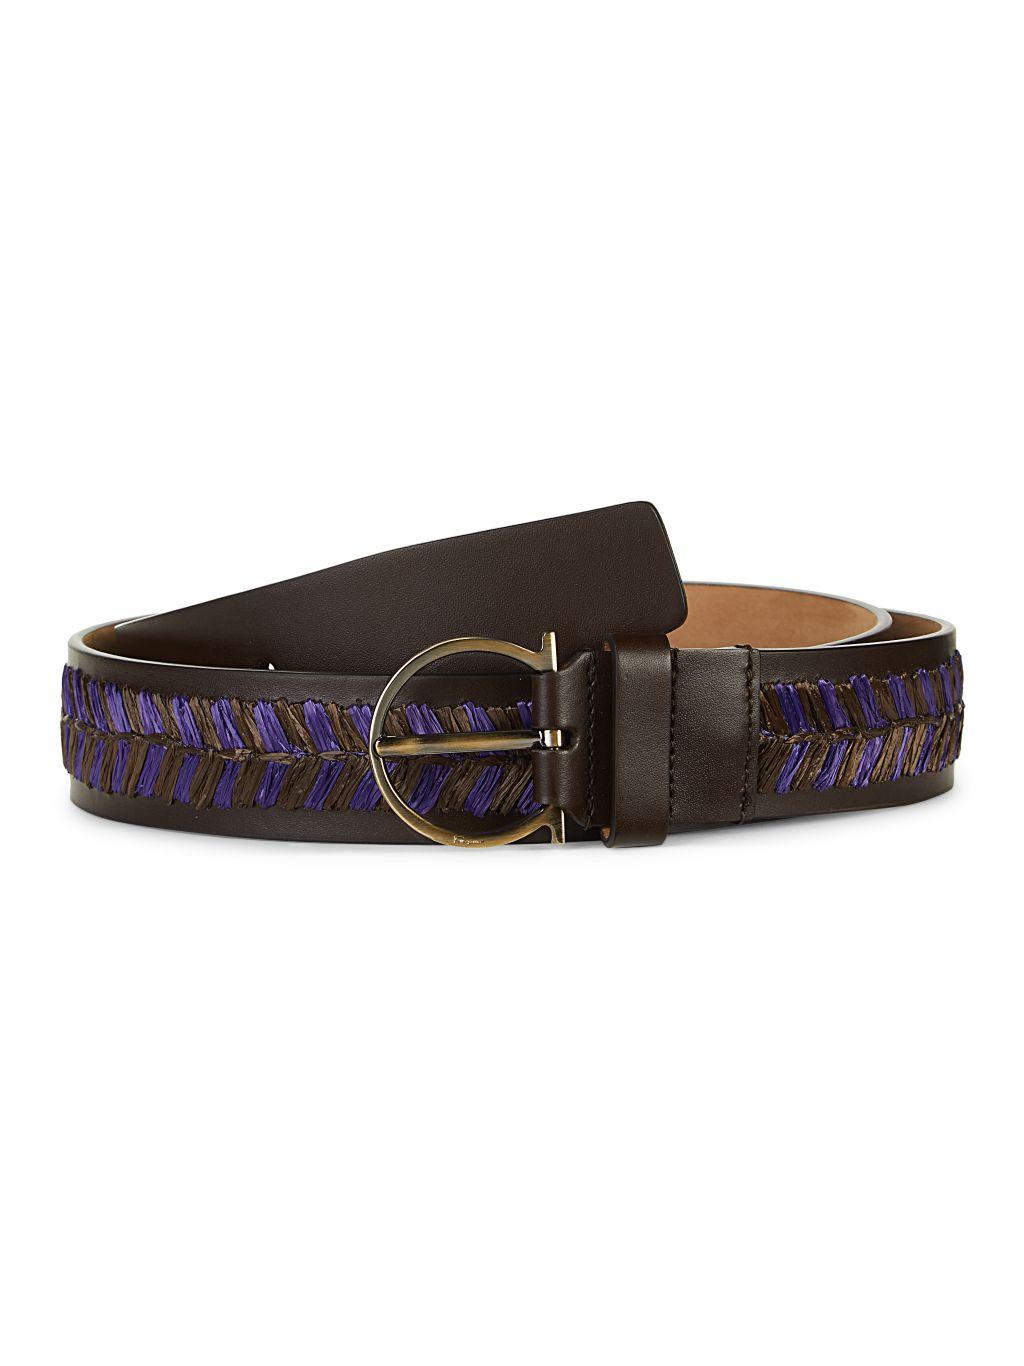 Salvatore Ferragamo Leather & Raffia Belt